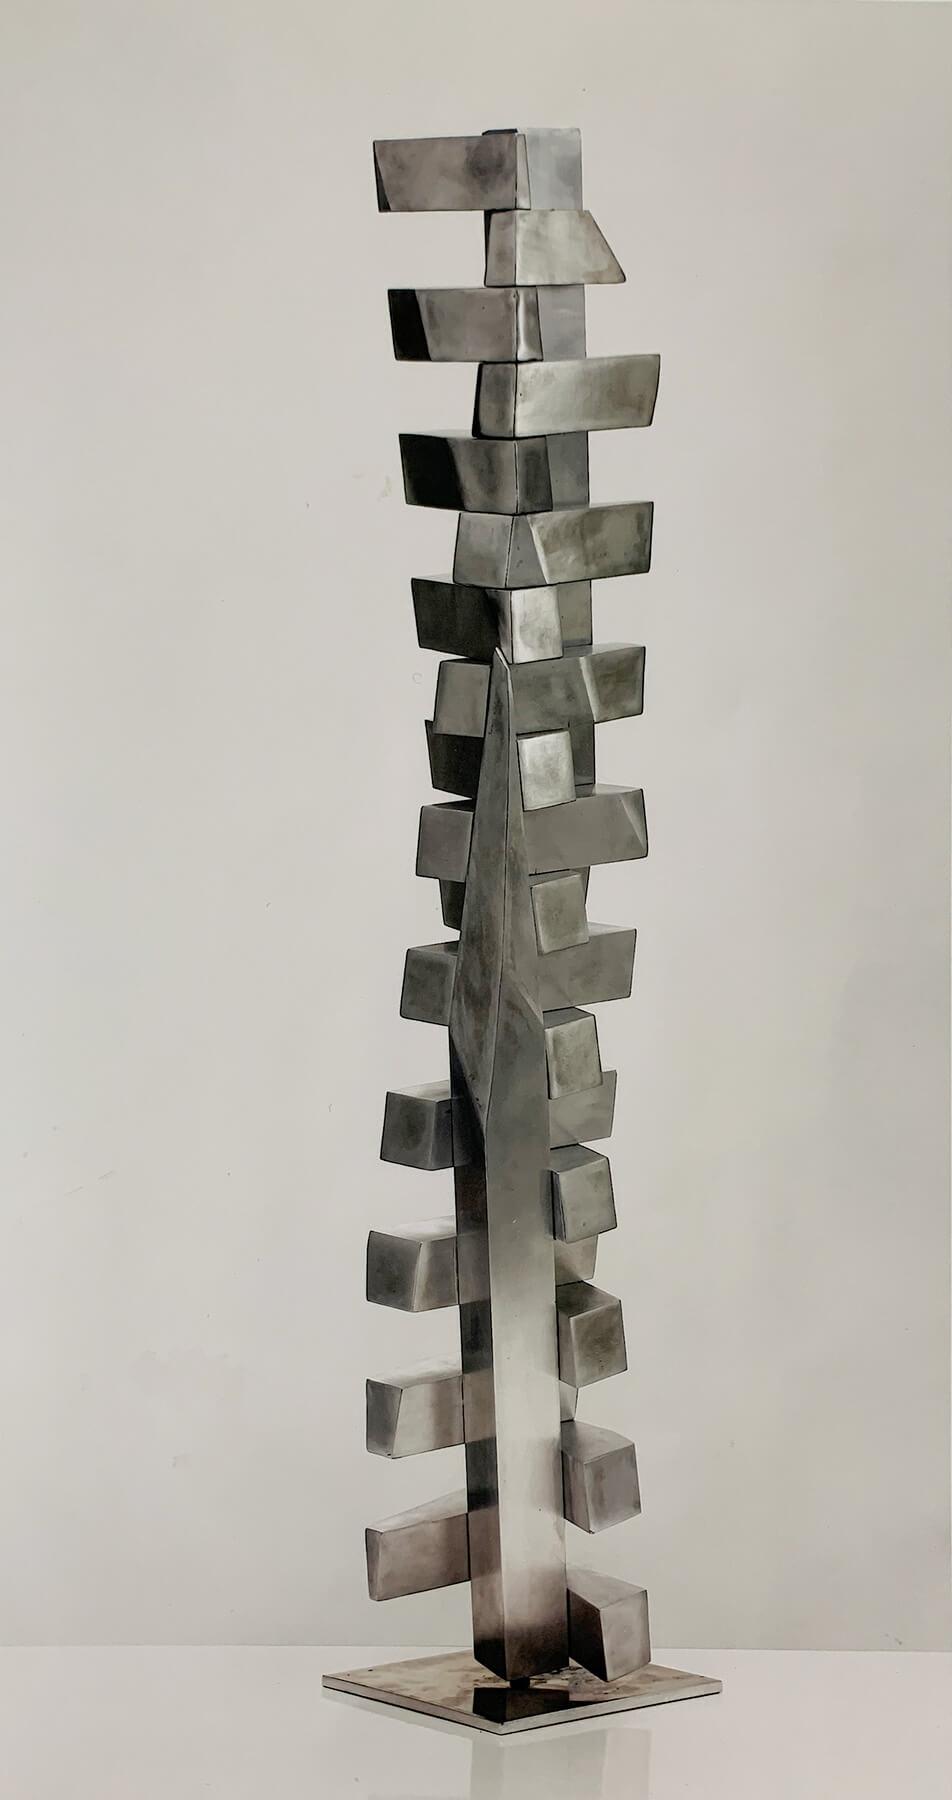 Bildhauer OMI Riesterer Skulpturen Glänzend Stehend Aluminium geschweißt